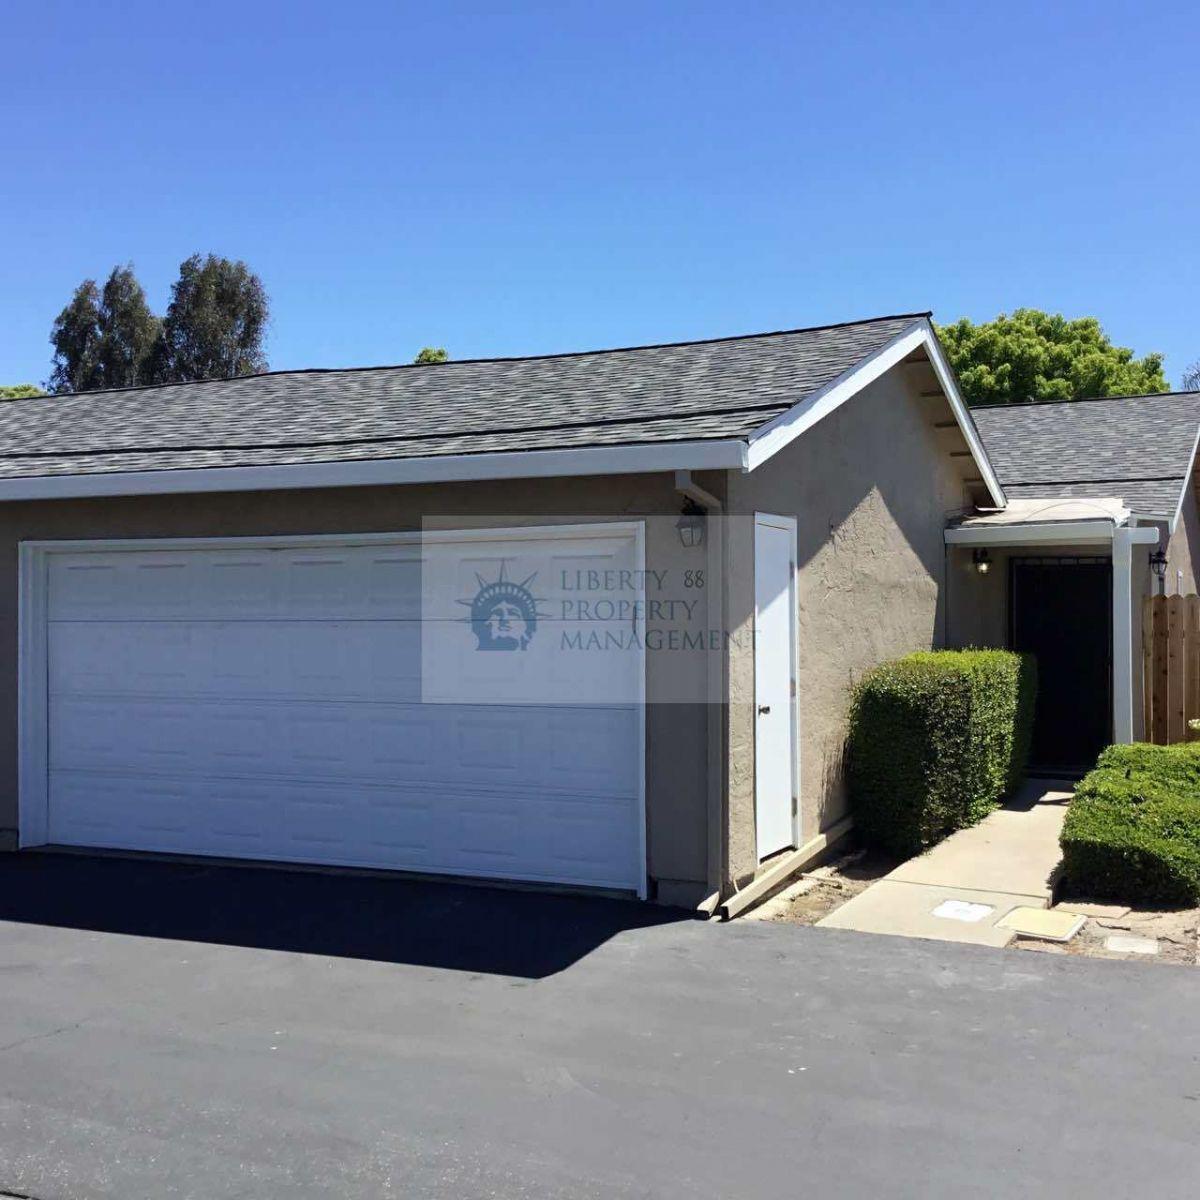 Find Rental Properties Online: 4000 Fara Biundo Drive #88 Modesto, CA 95355